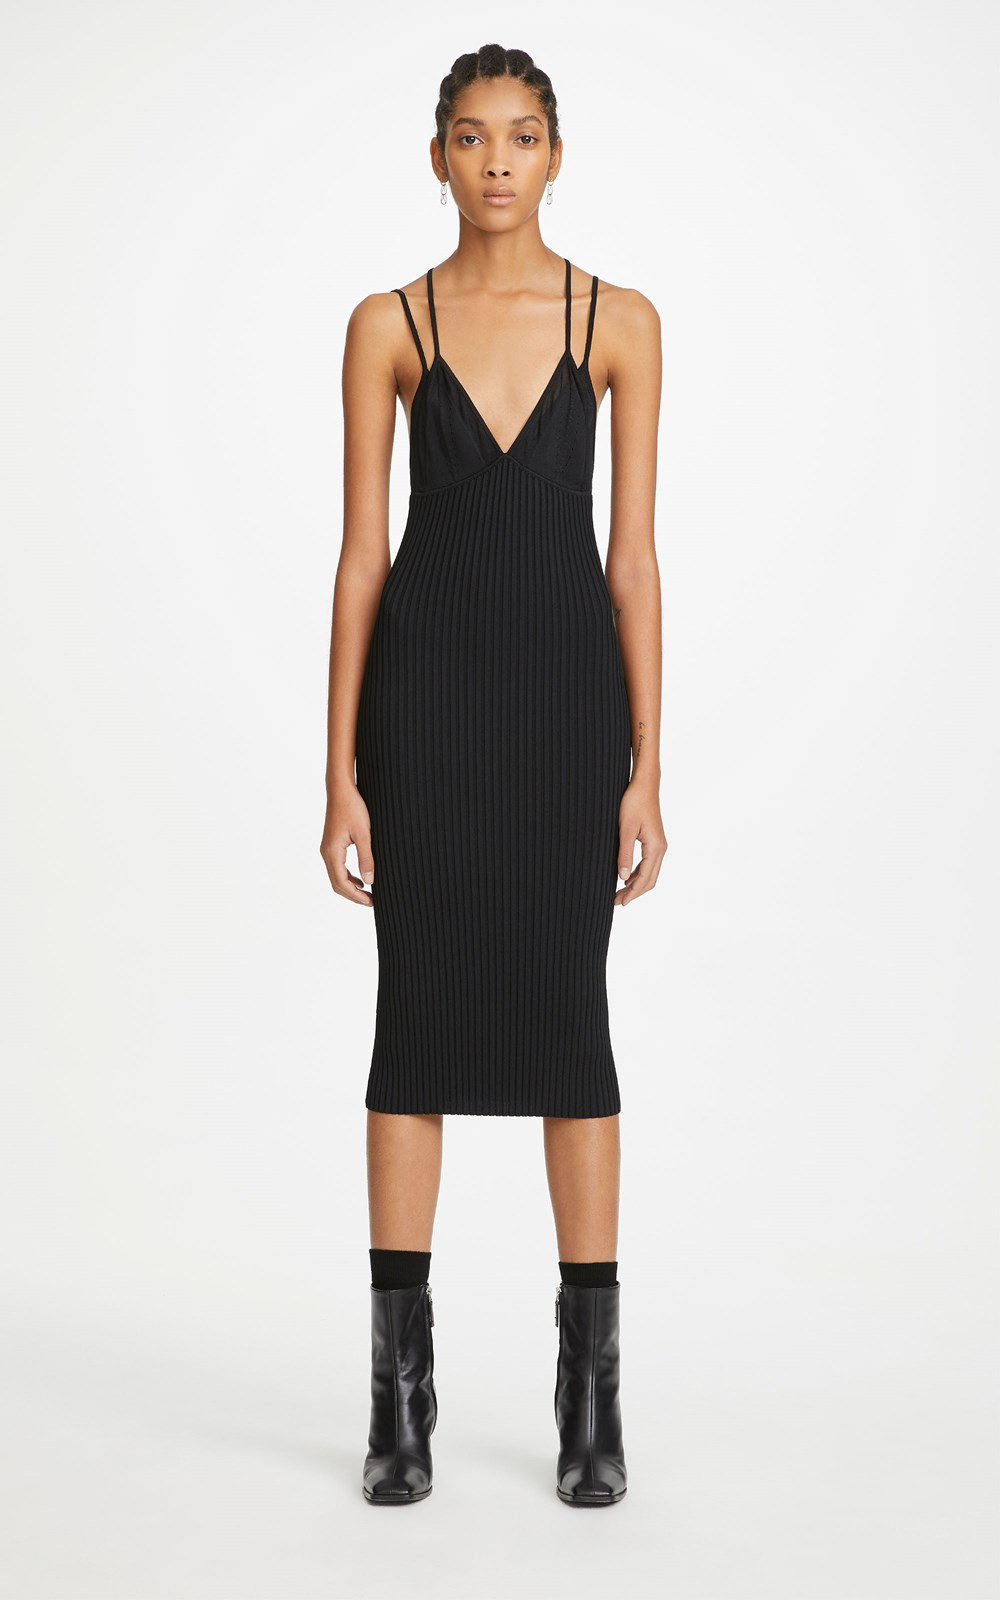 Dresses | LAYERED BRA DRESS